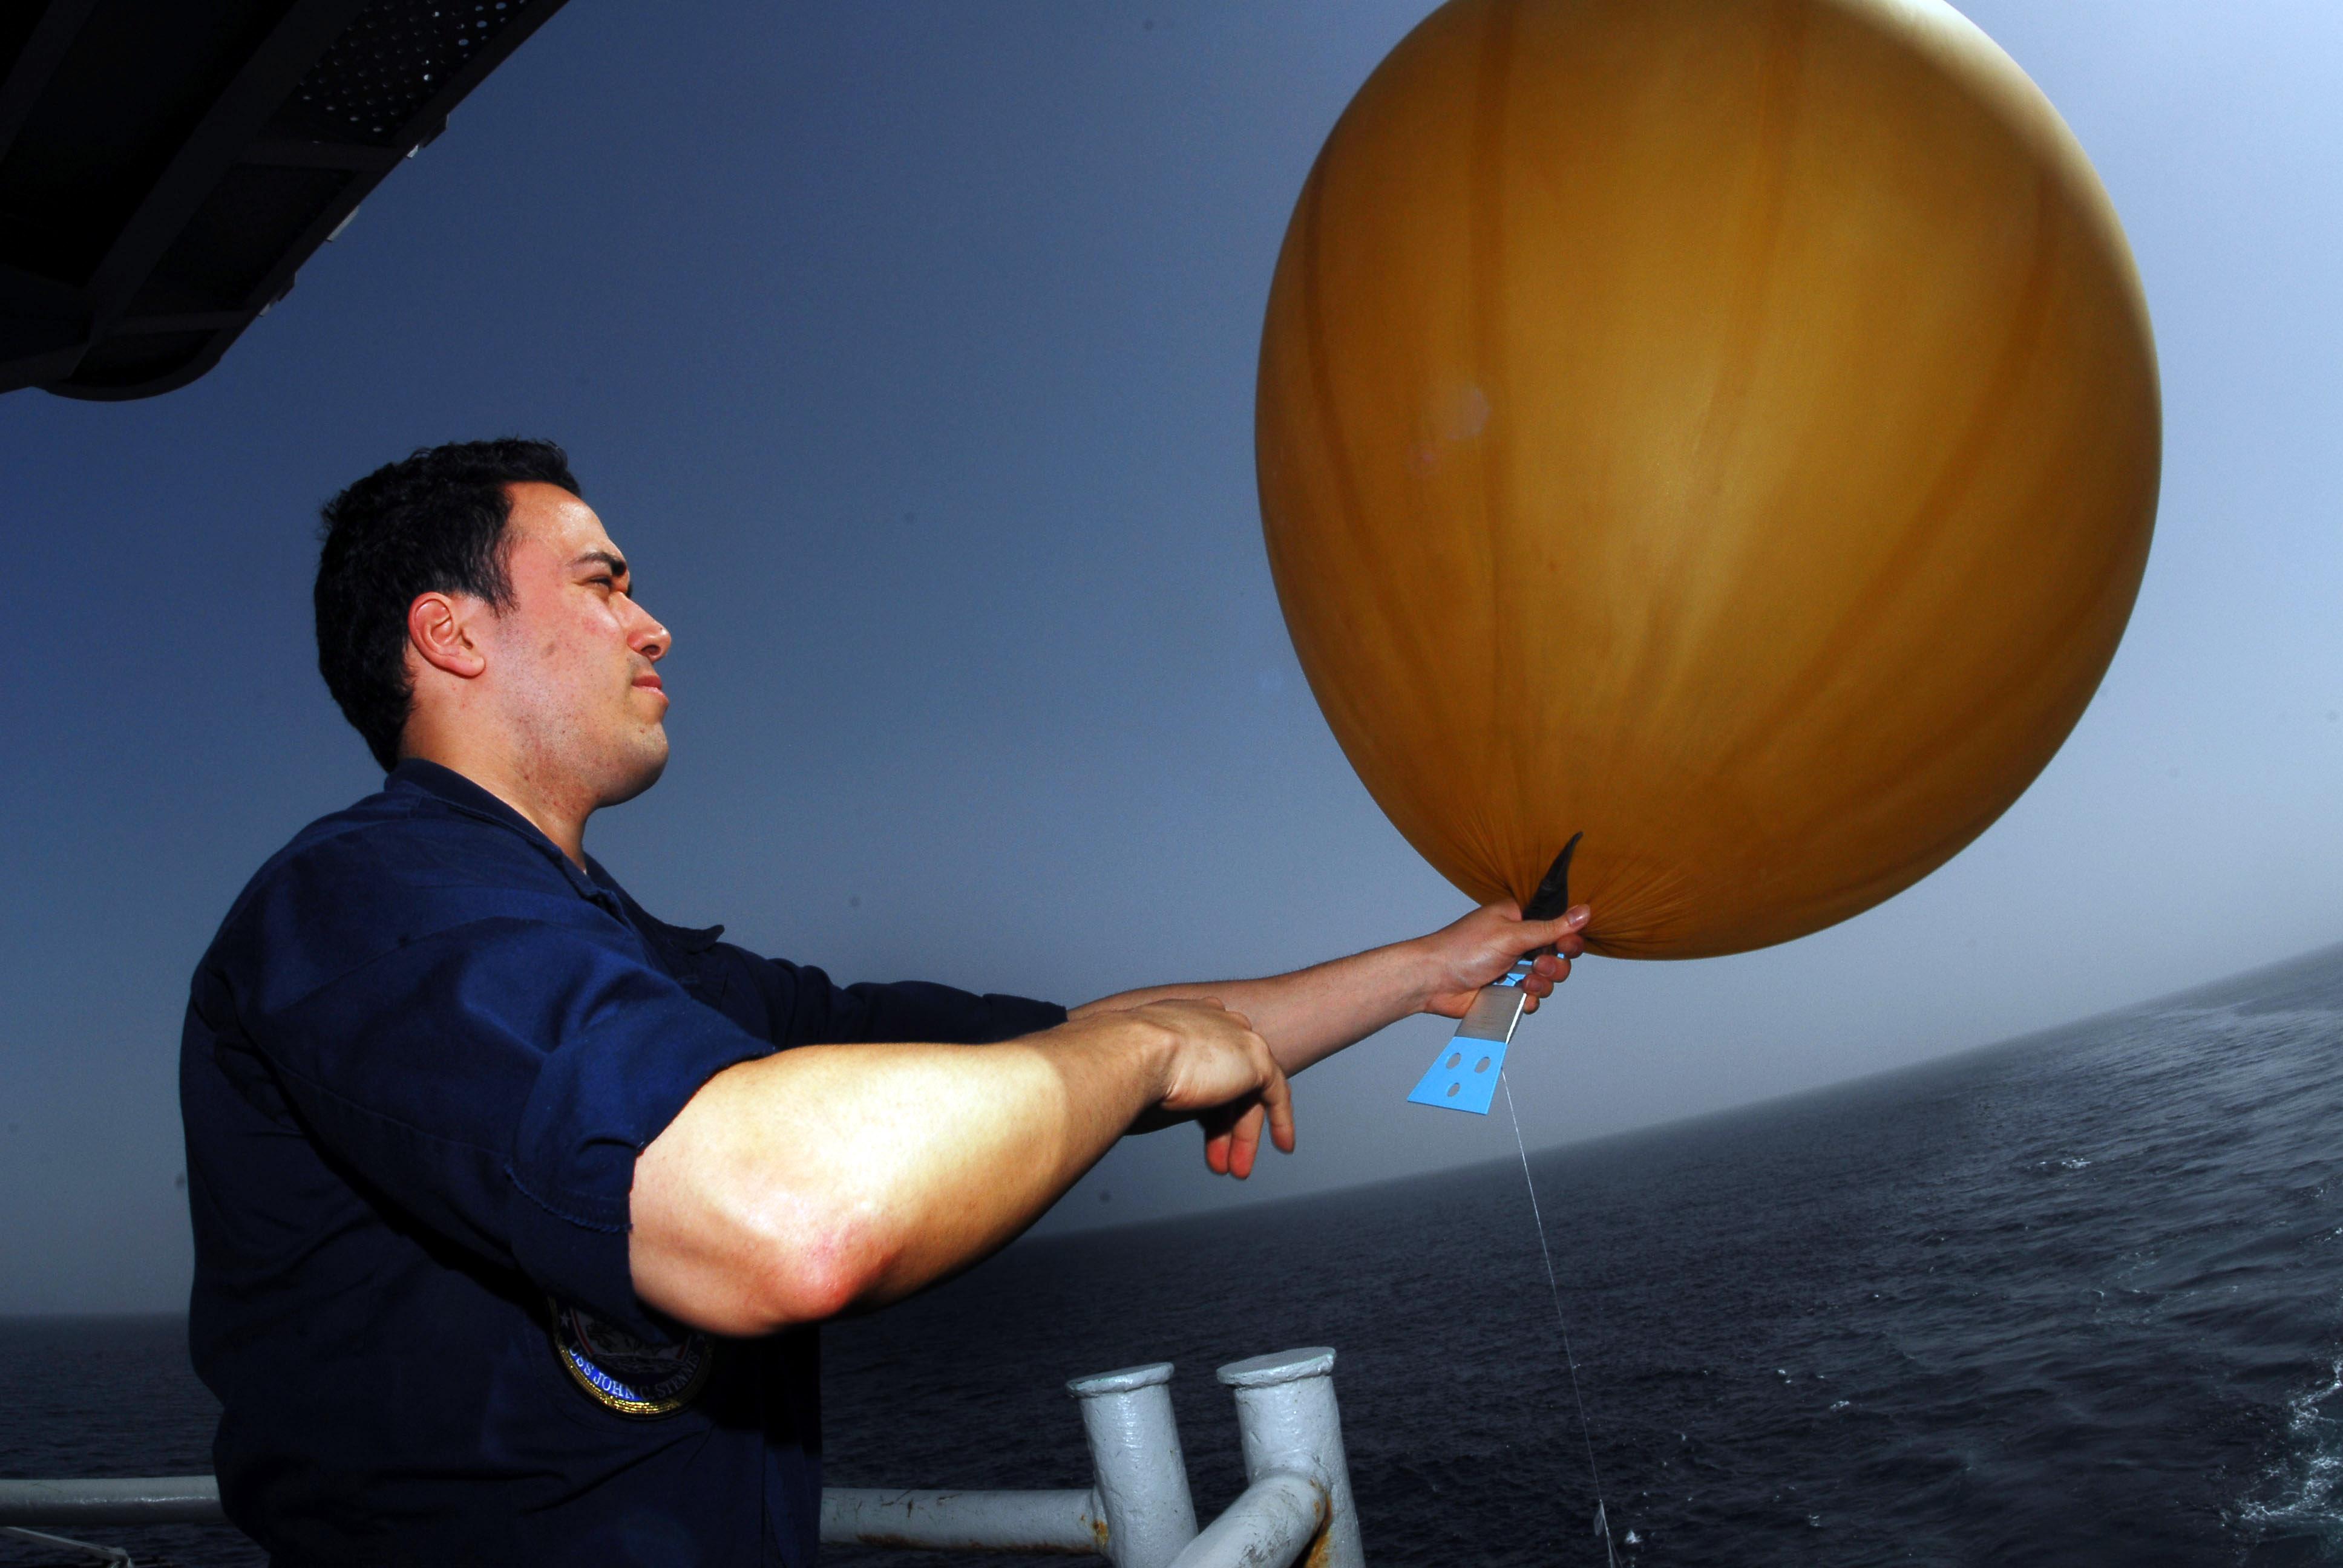 File:US Navy 070305-N-9928E-076 Airman Jaime Minor inflates a